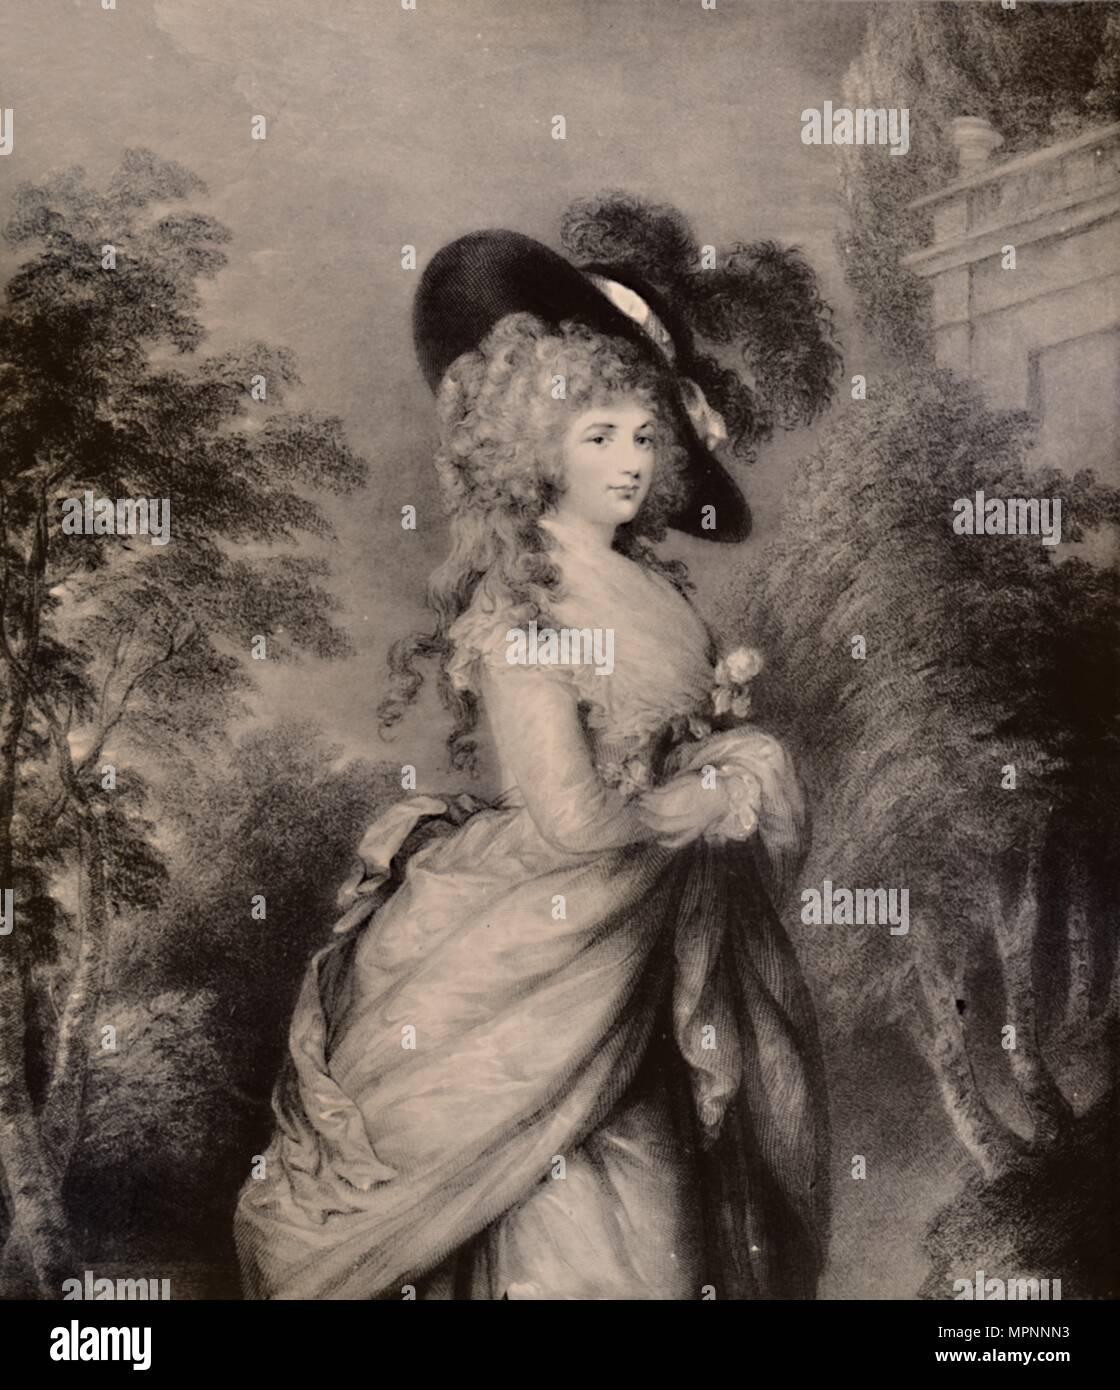 duchess of devonshire stock photos amp duchess of devonshire